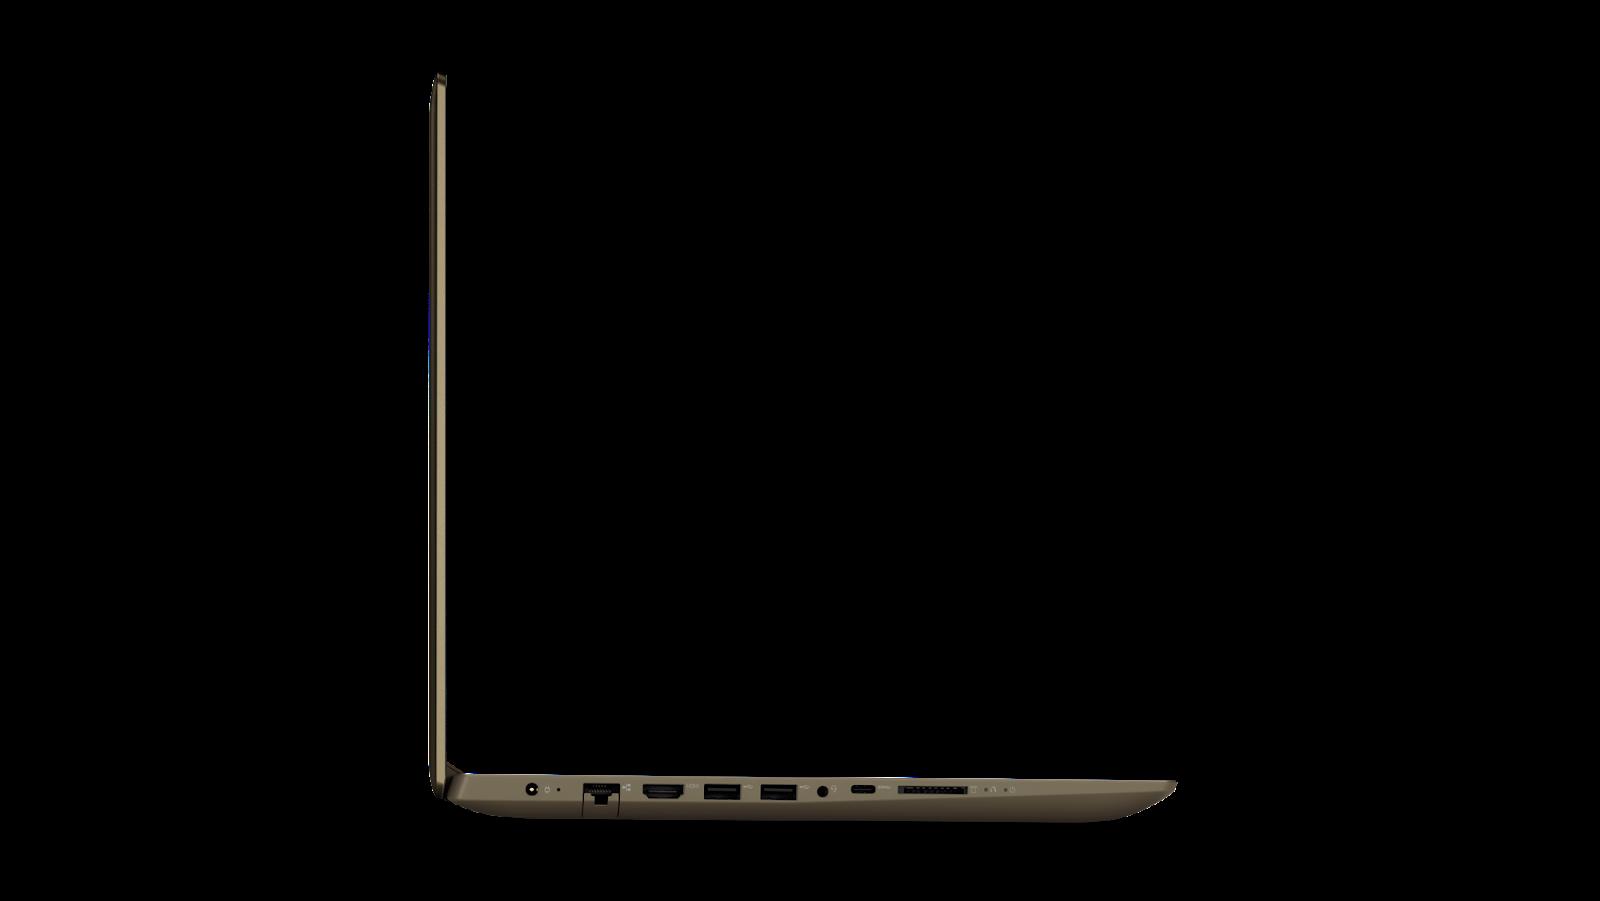 Фото 5 - Ноутбук Lenovo IdeaPad 520-15IKB Bronze (80YL00STRA)